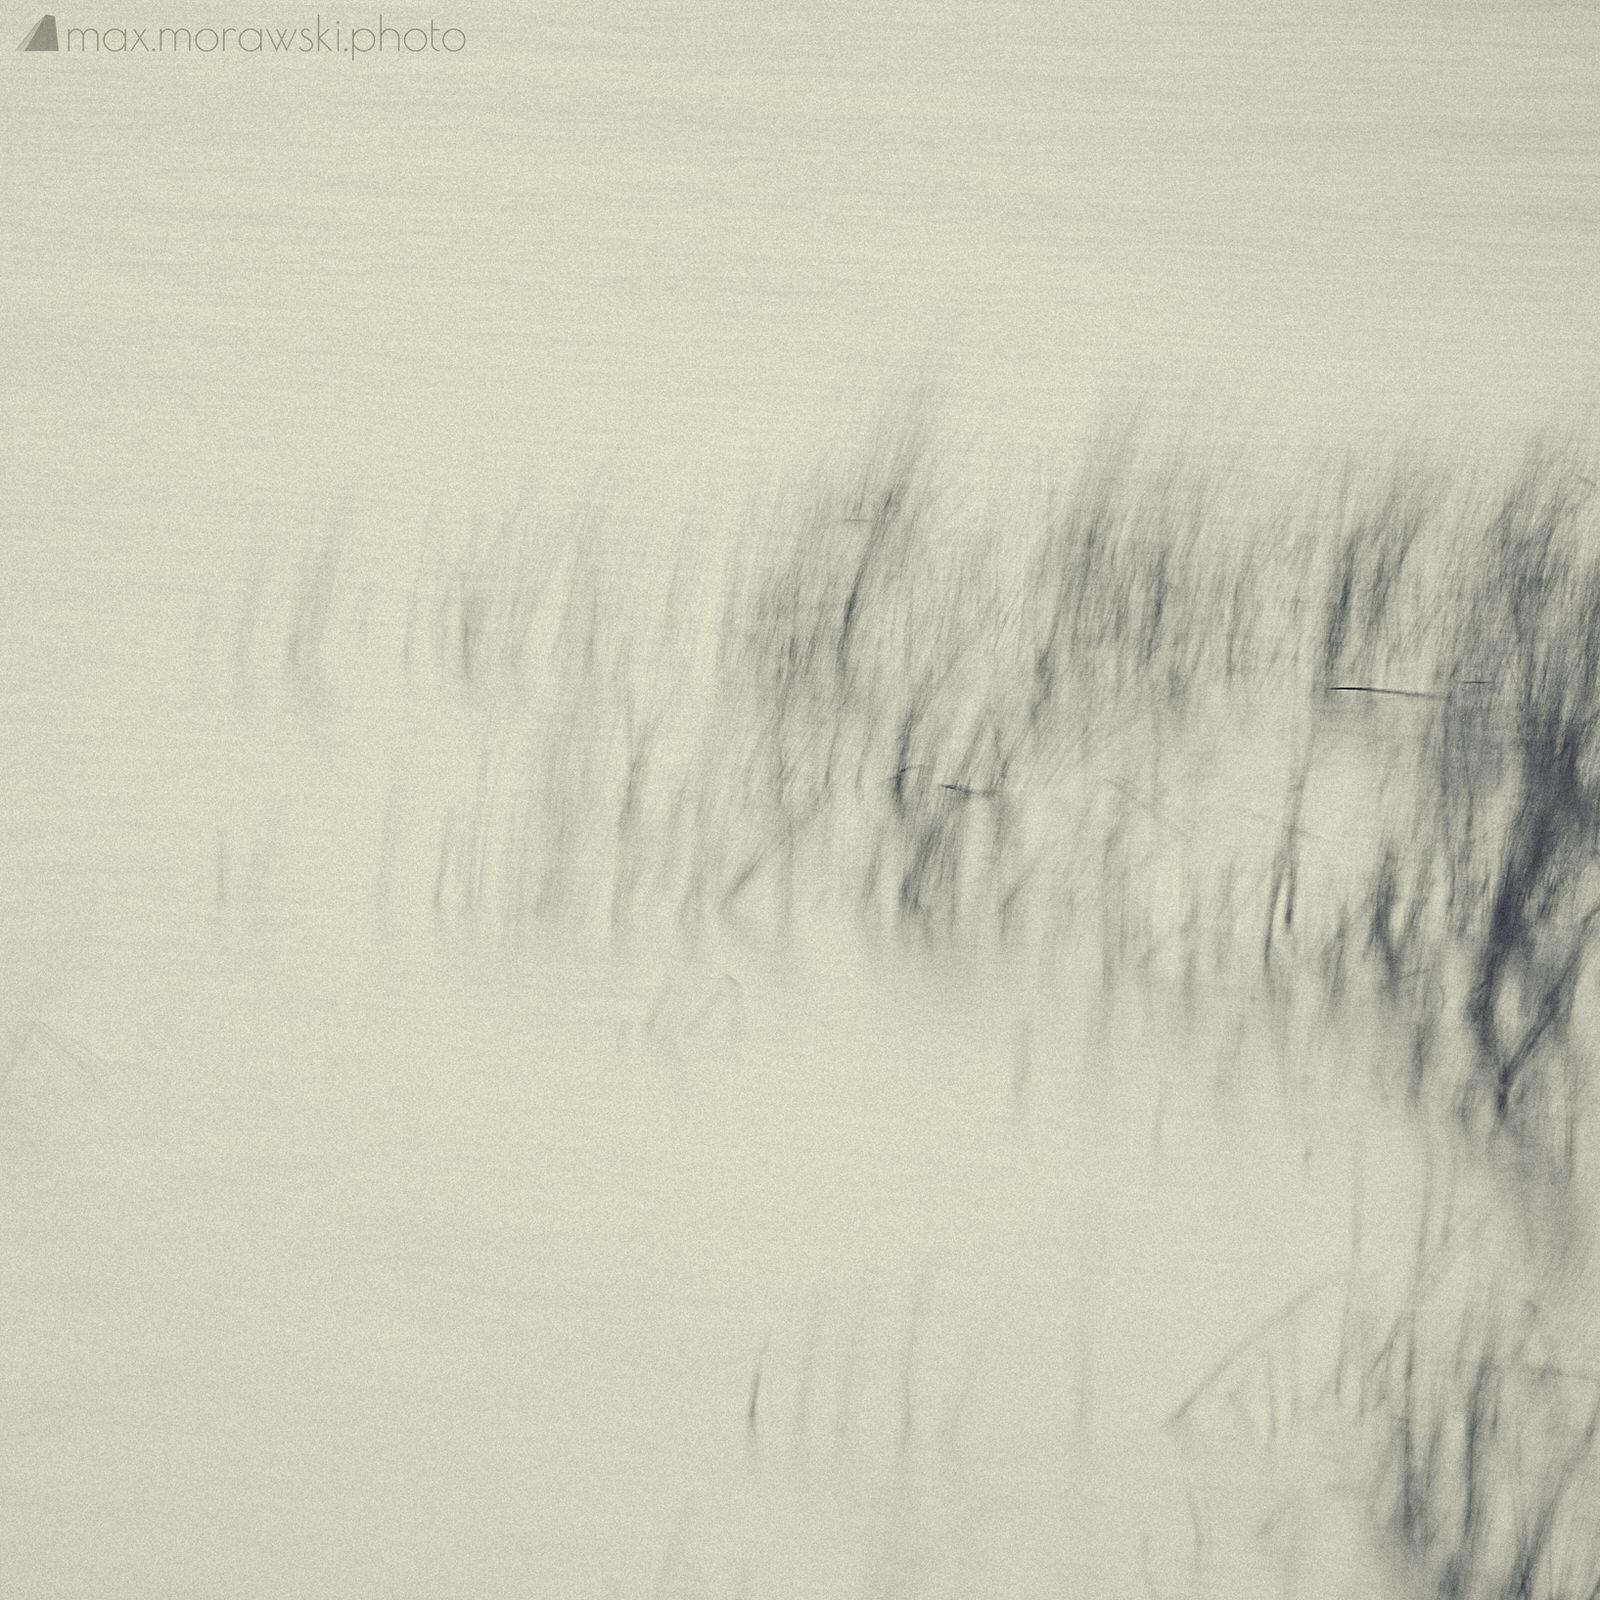 November Reeds; Charcoal study #7